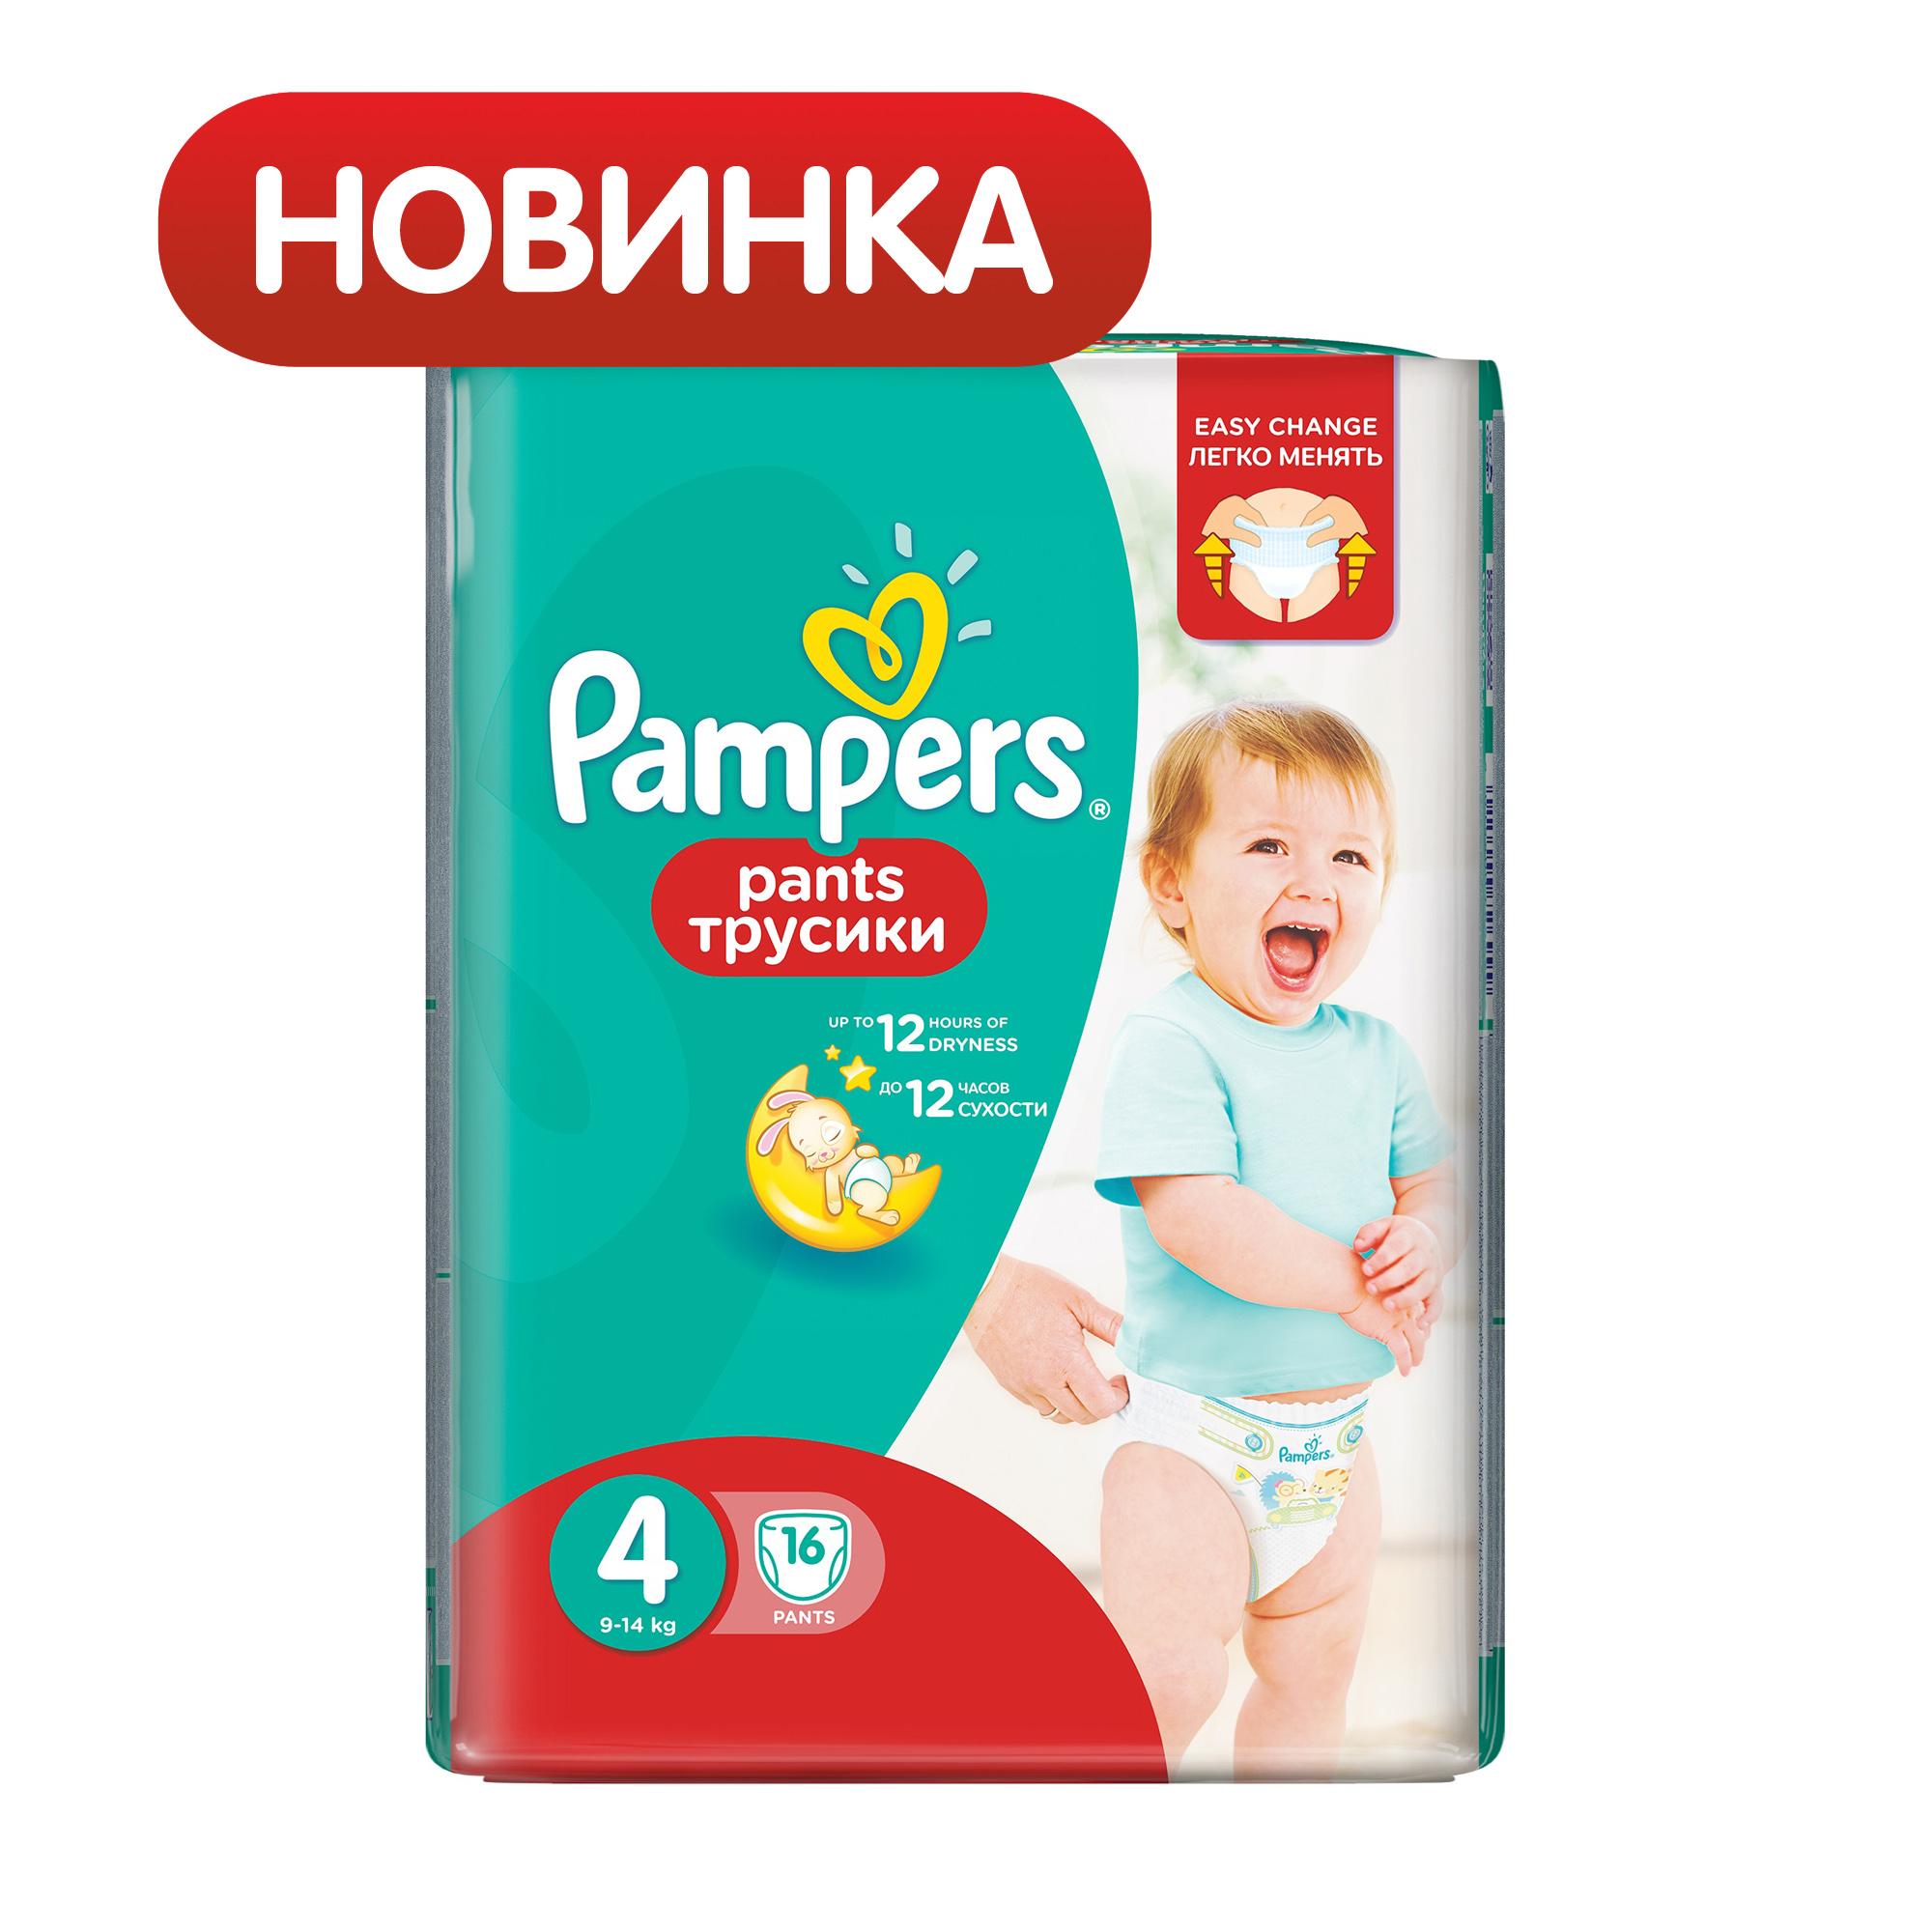 Трусики Pampers Pants Maxi 9-14 кг (16 шт) Размер 4<br>